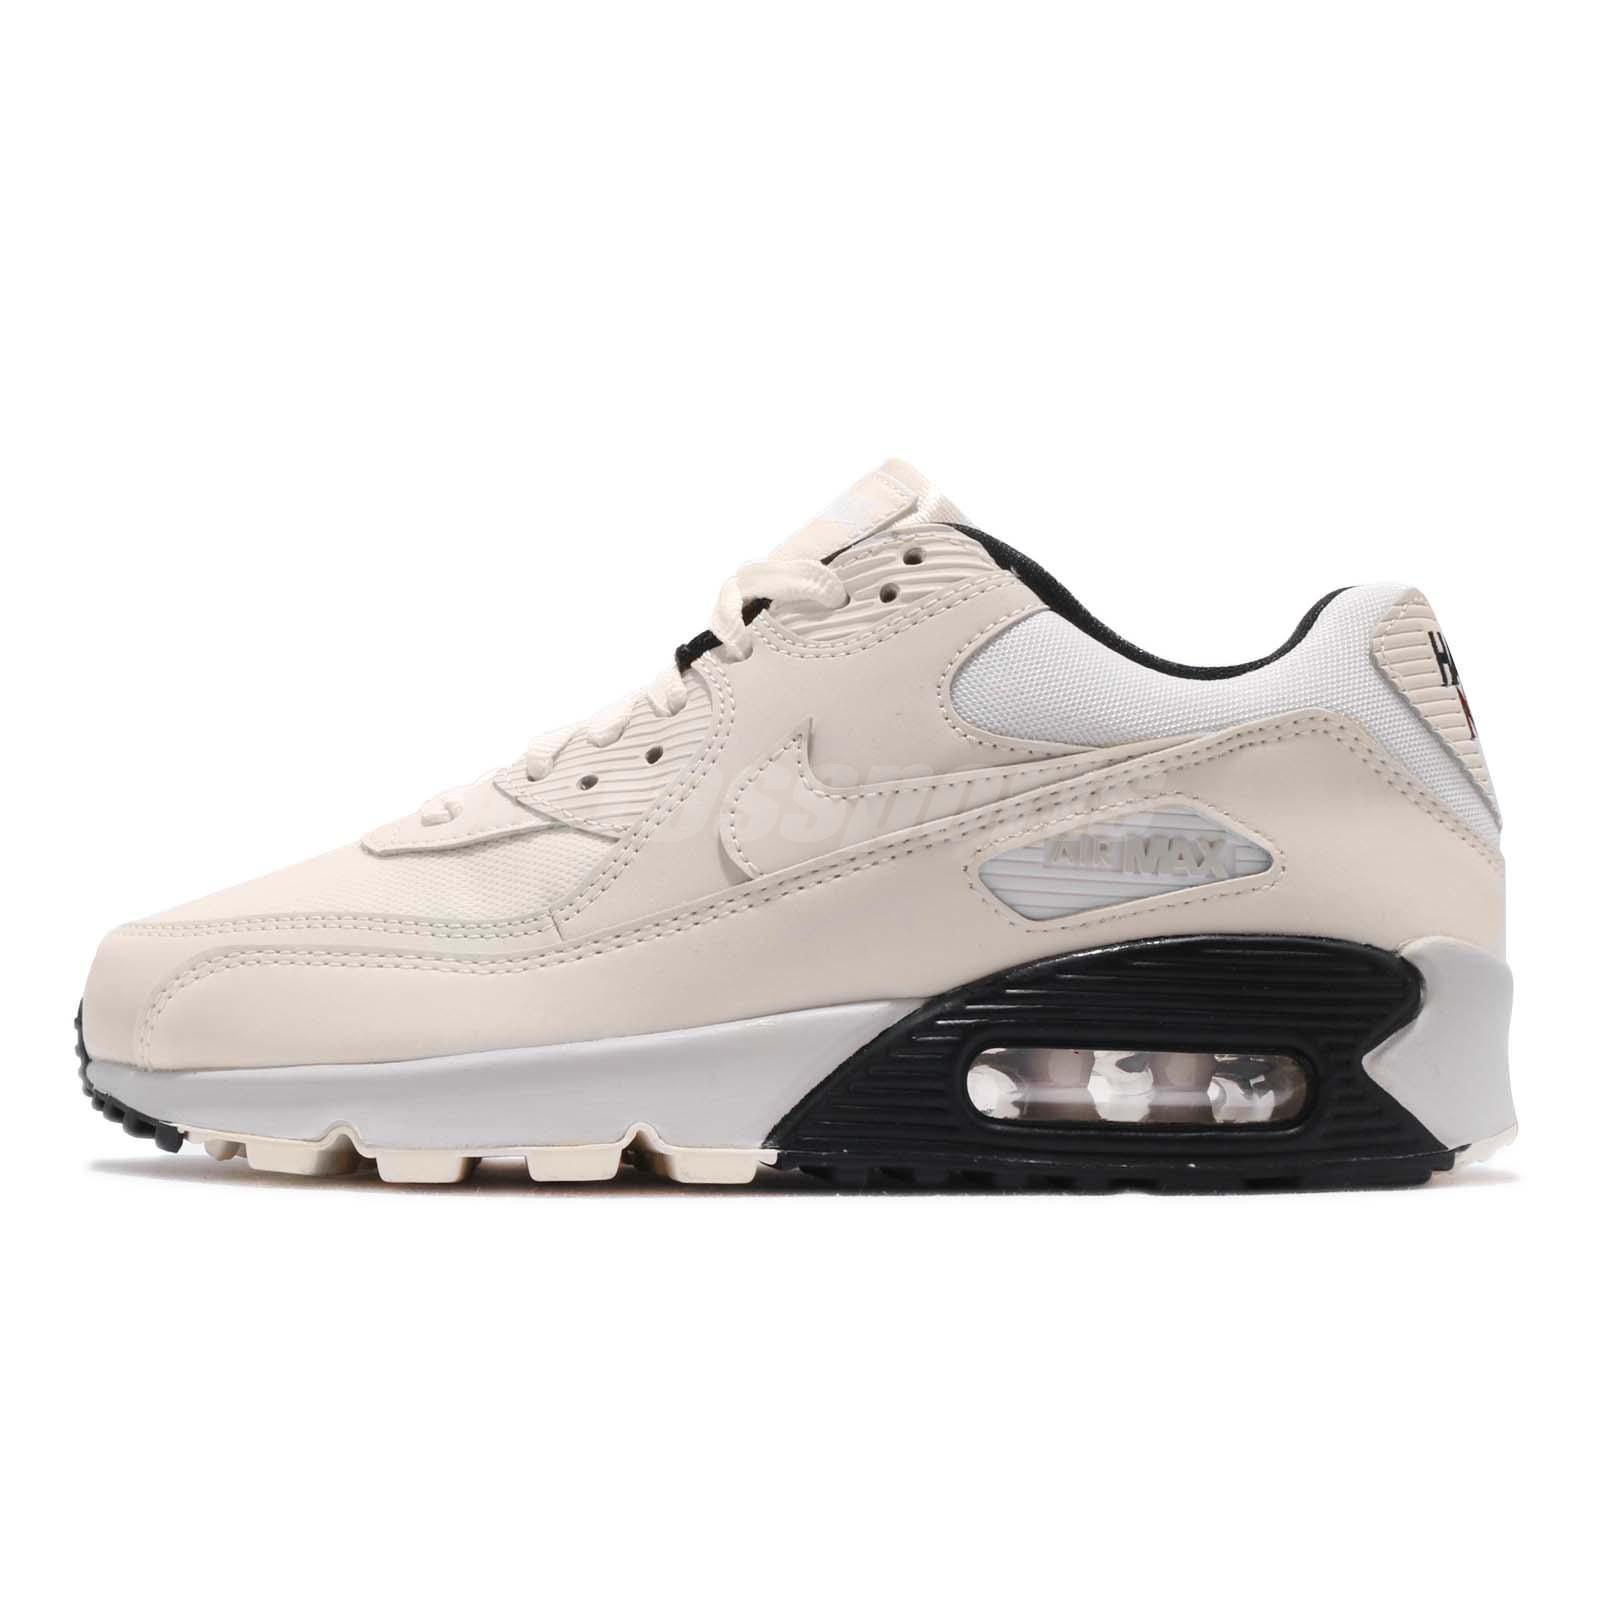 Nike Shoes   Womens Air Max 90 Black Sneakers   Poshmark